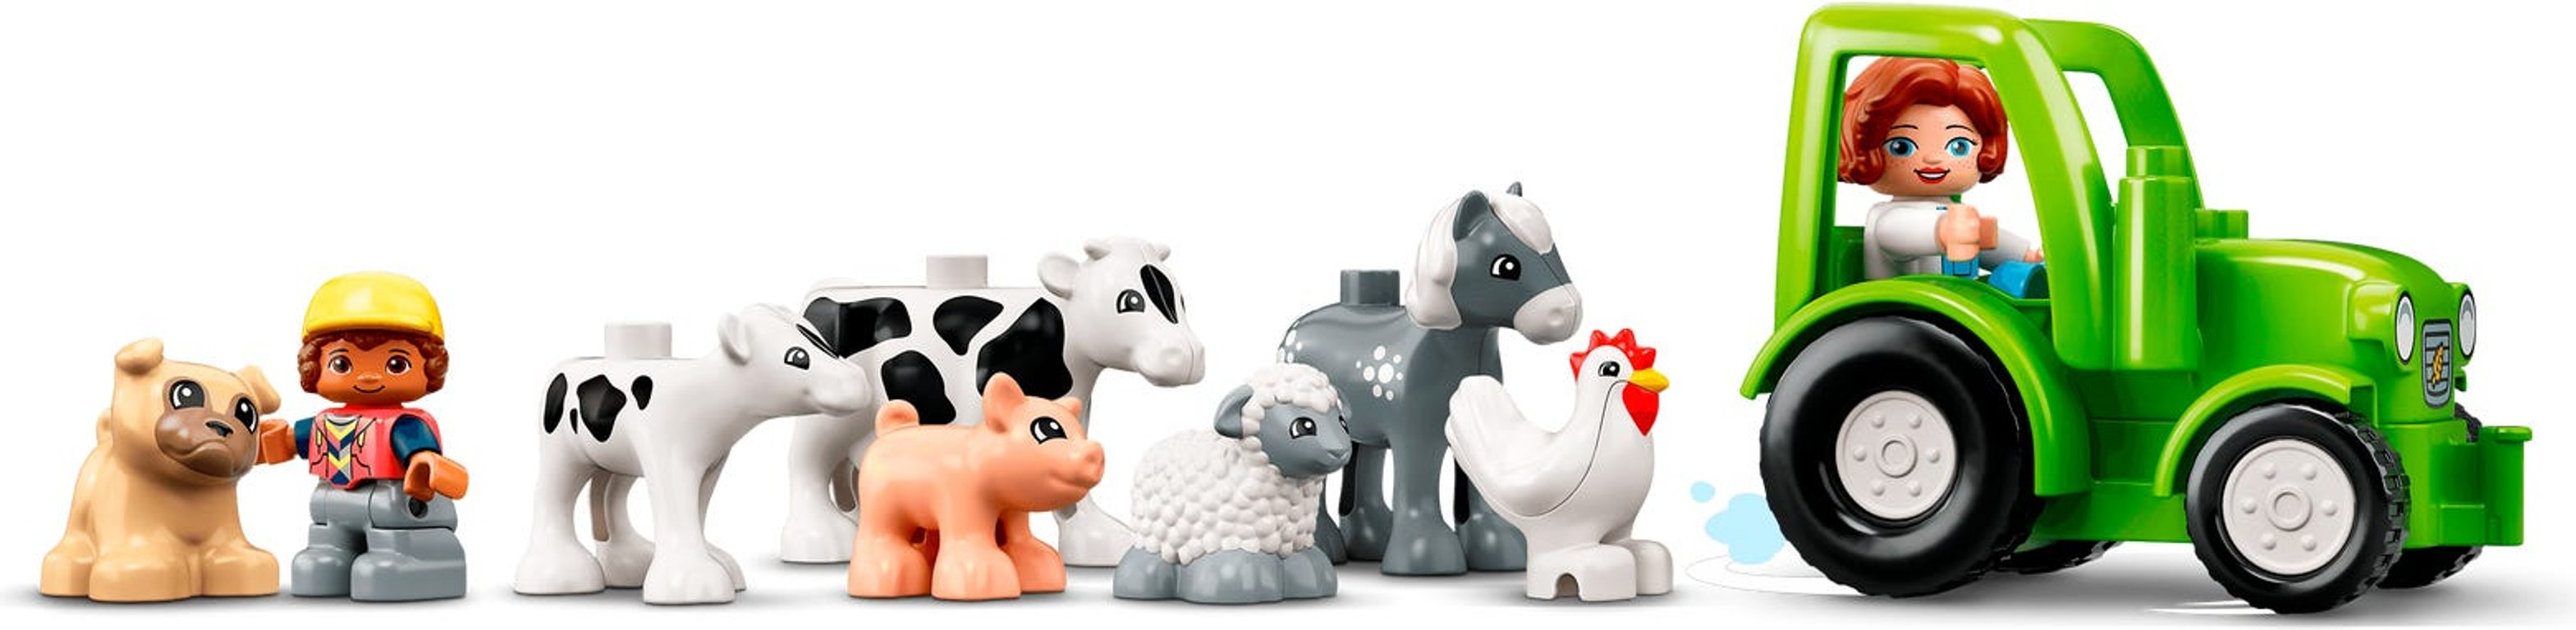 LEGO® DUPLO® Barn, Tractor & Farm Animal Care animals